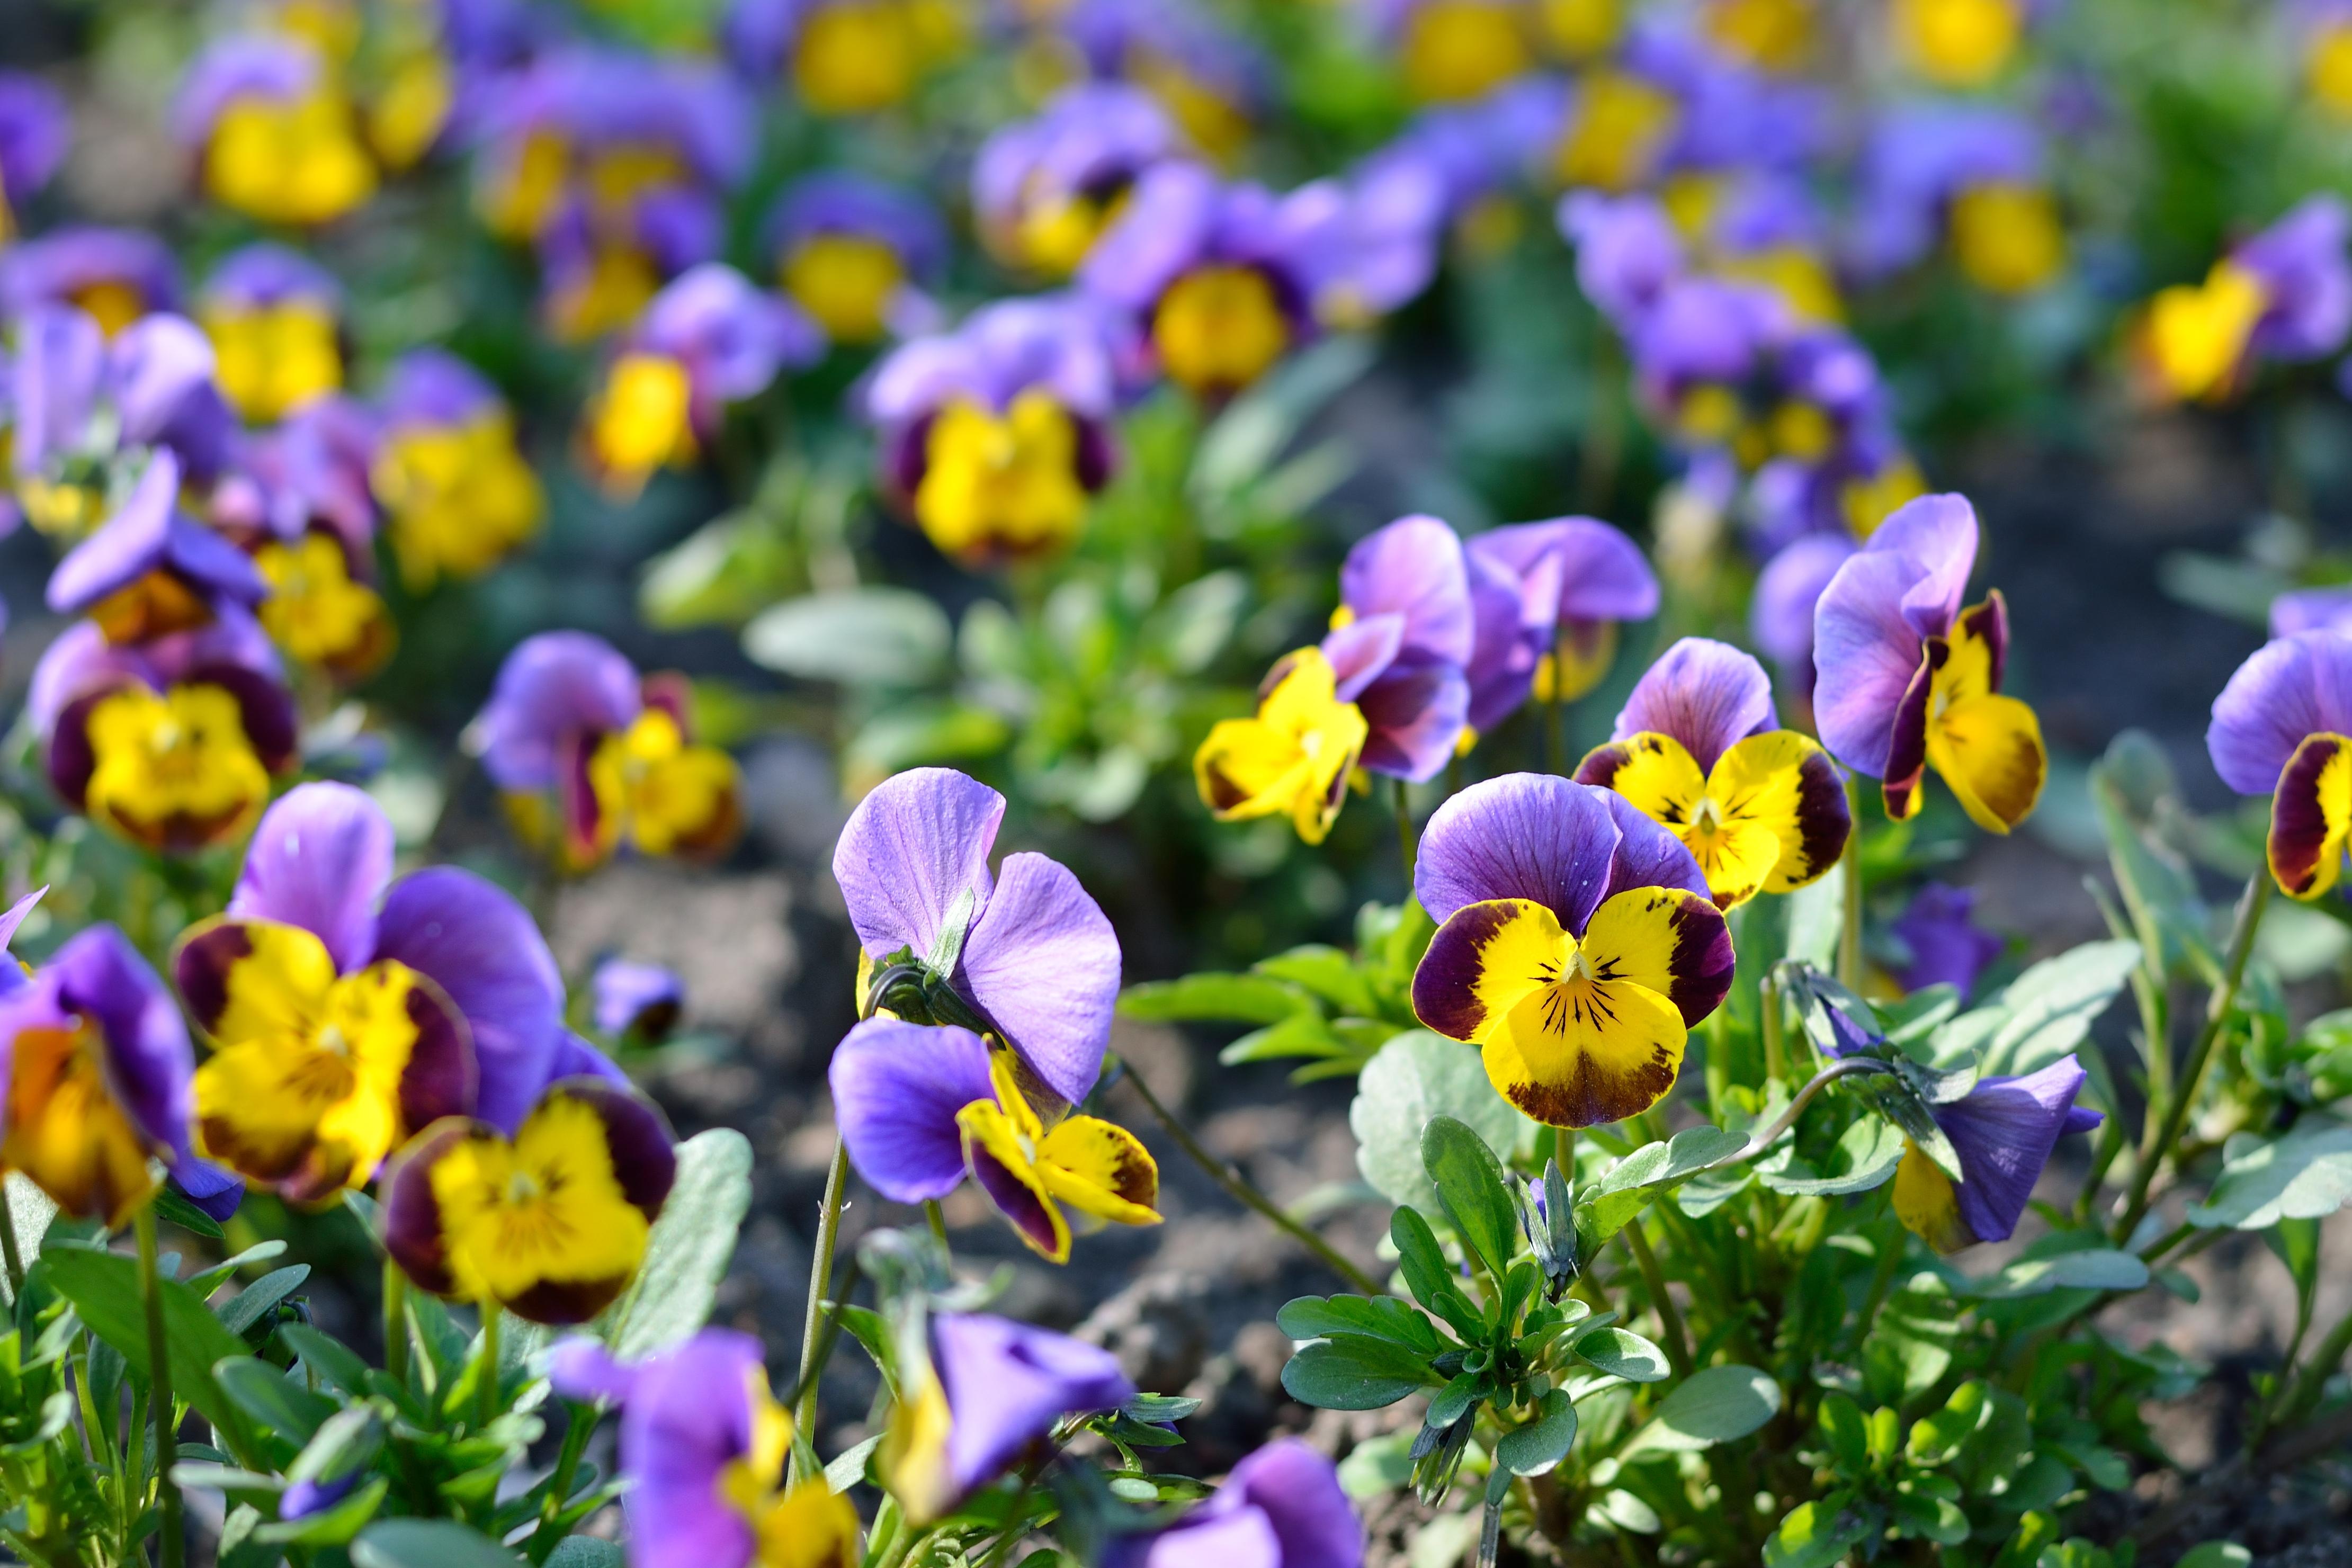 heartsease flower (Viola tricolor) in spring